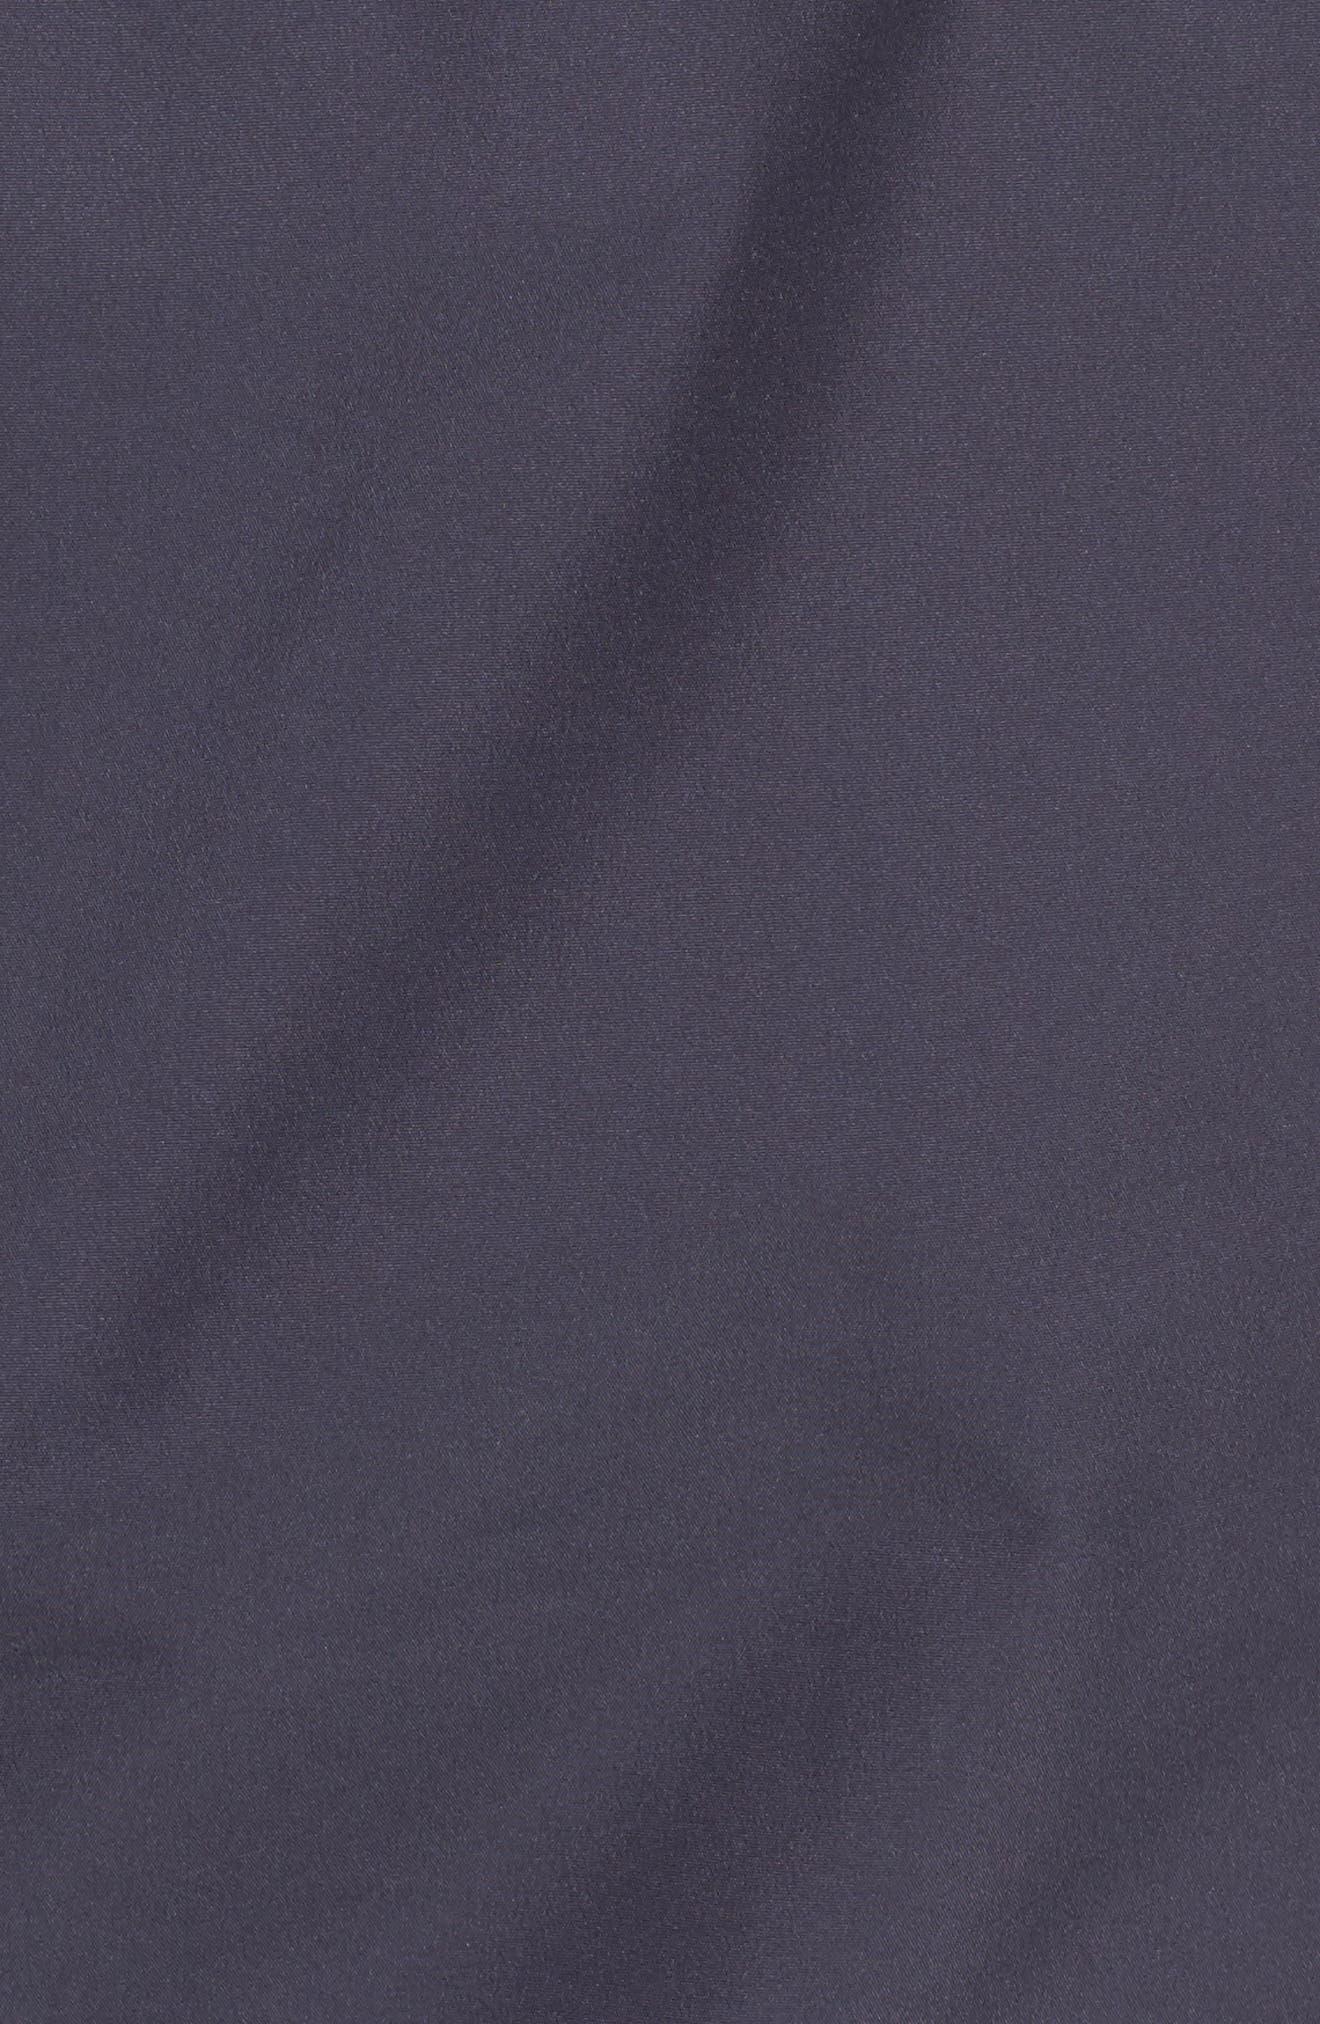 'Aden' Helly Tech<sup>®</sup> Raincoat,                             Alternate thumbnail 6, color,                             Graphite Blue